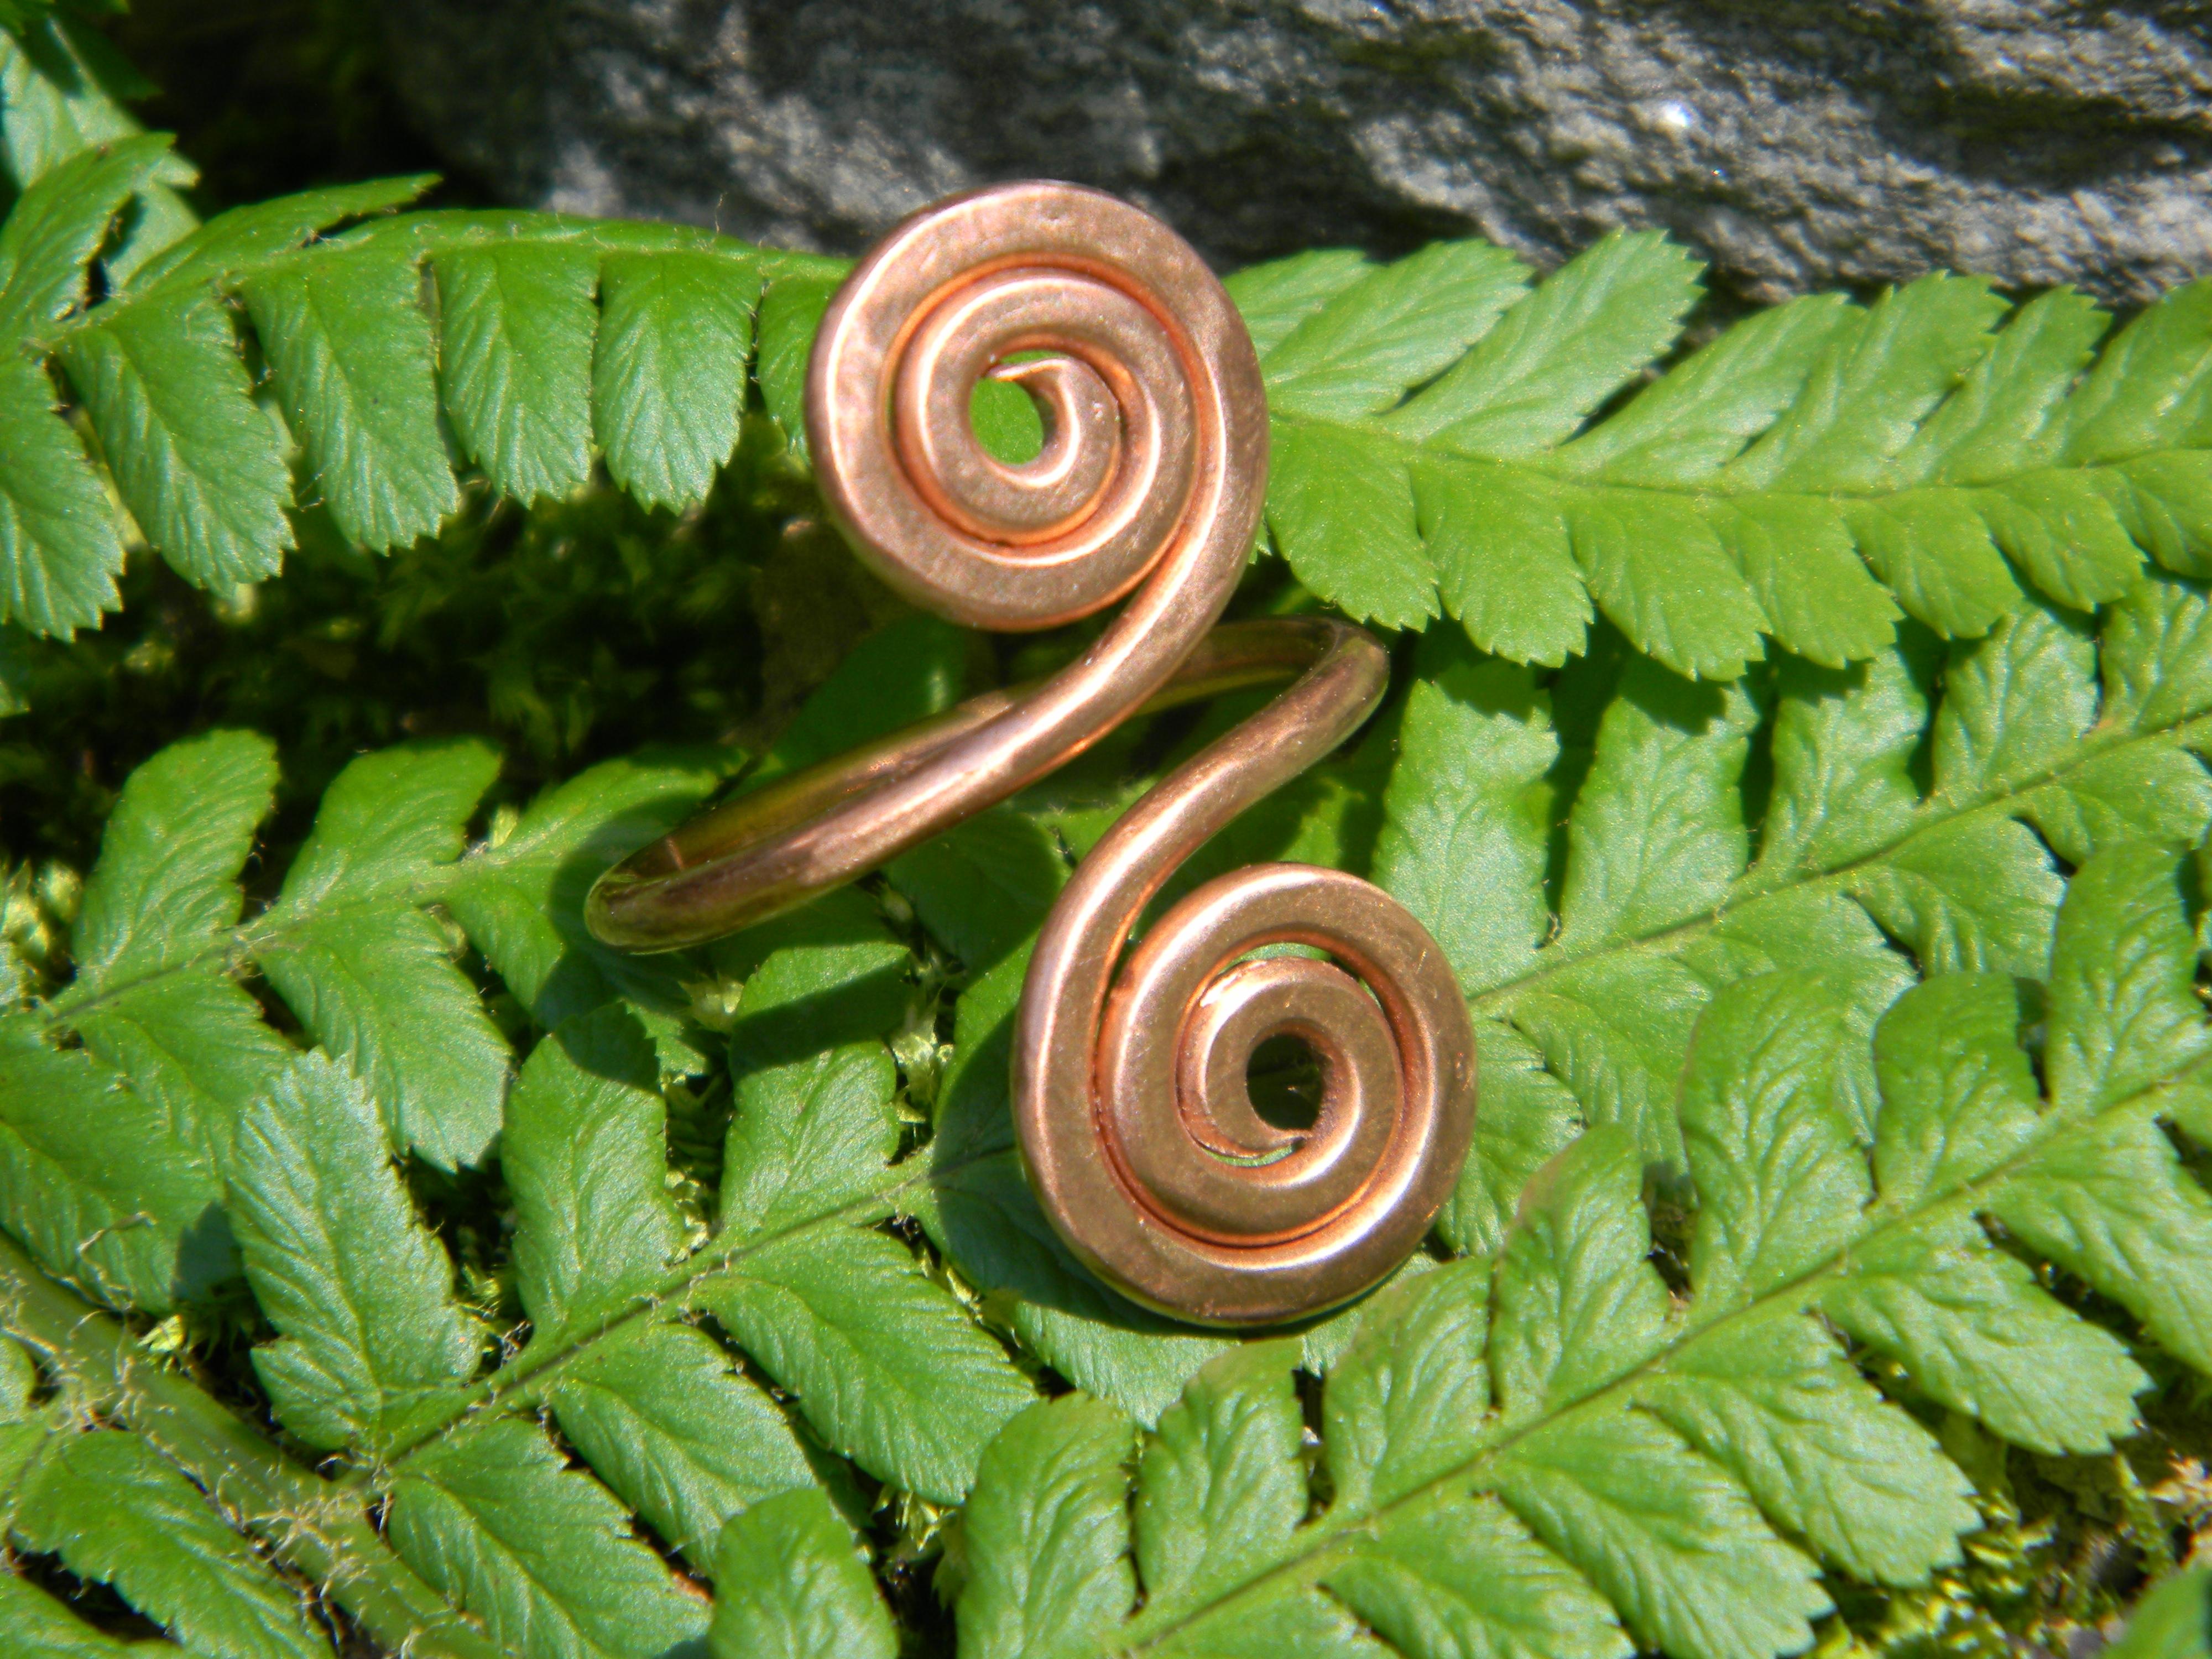 bottega-artigiana-milano-gioielli-rame-shop-on-line-anello